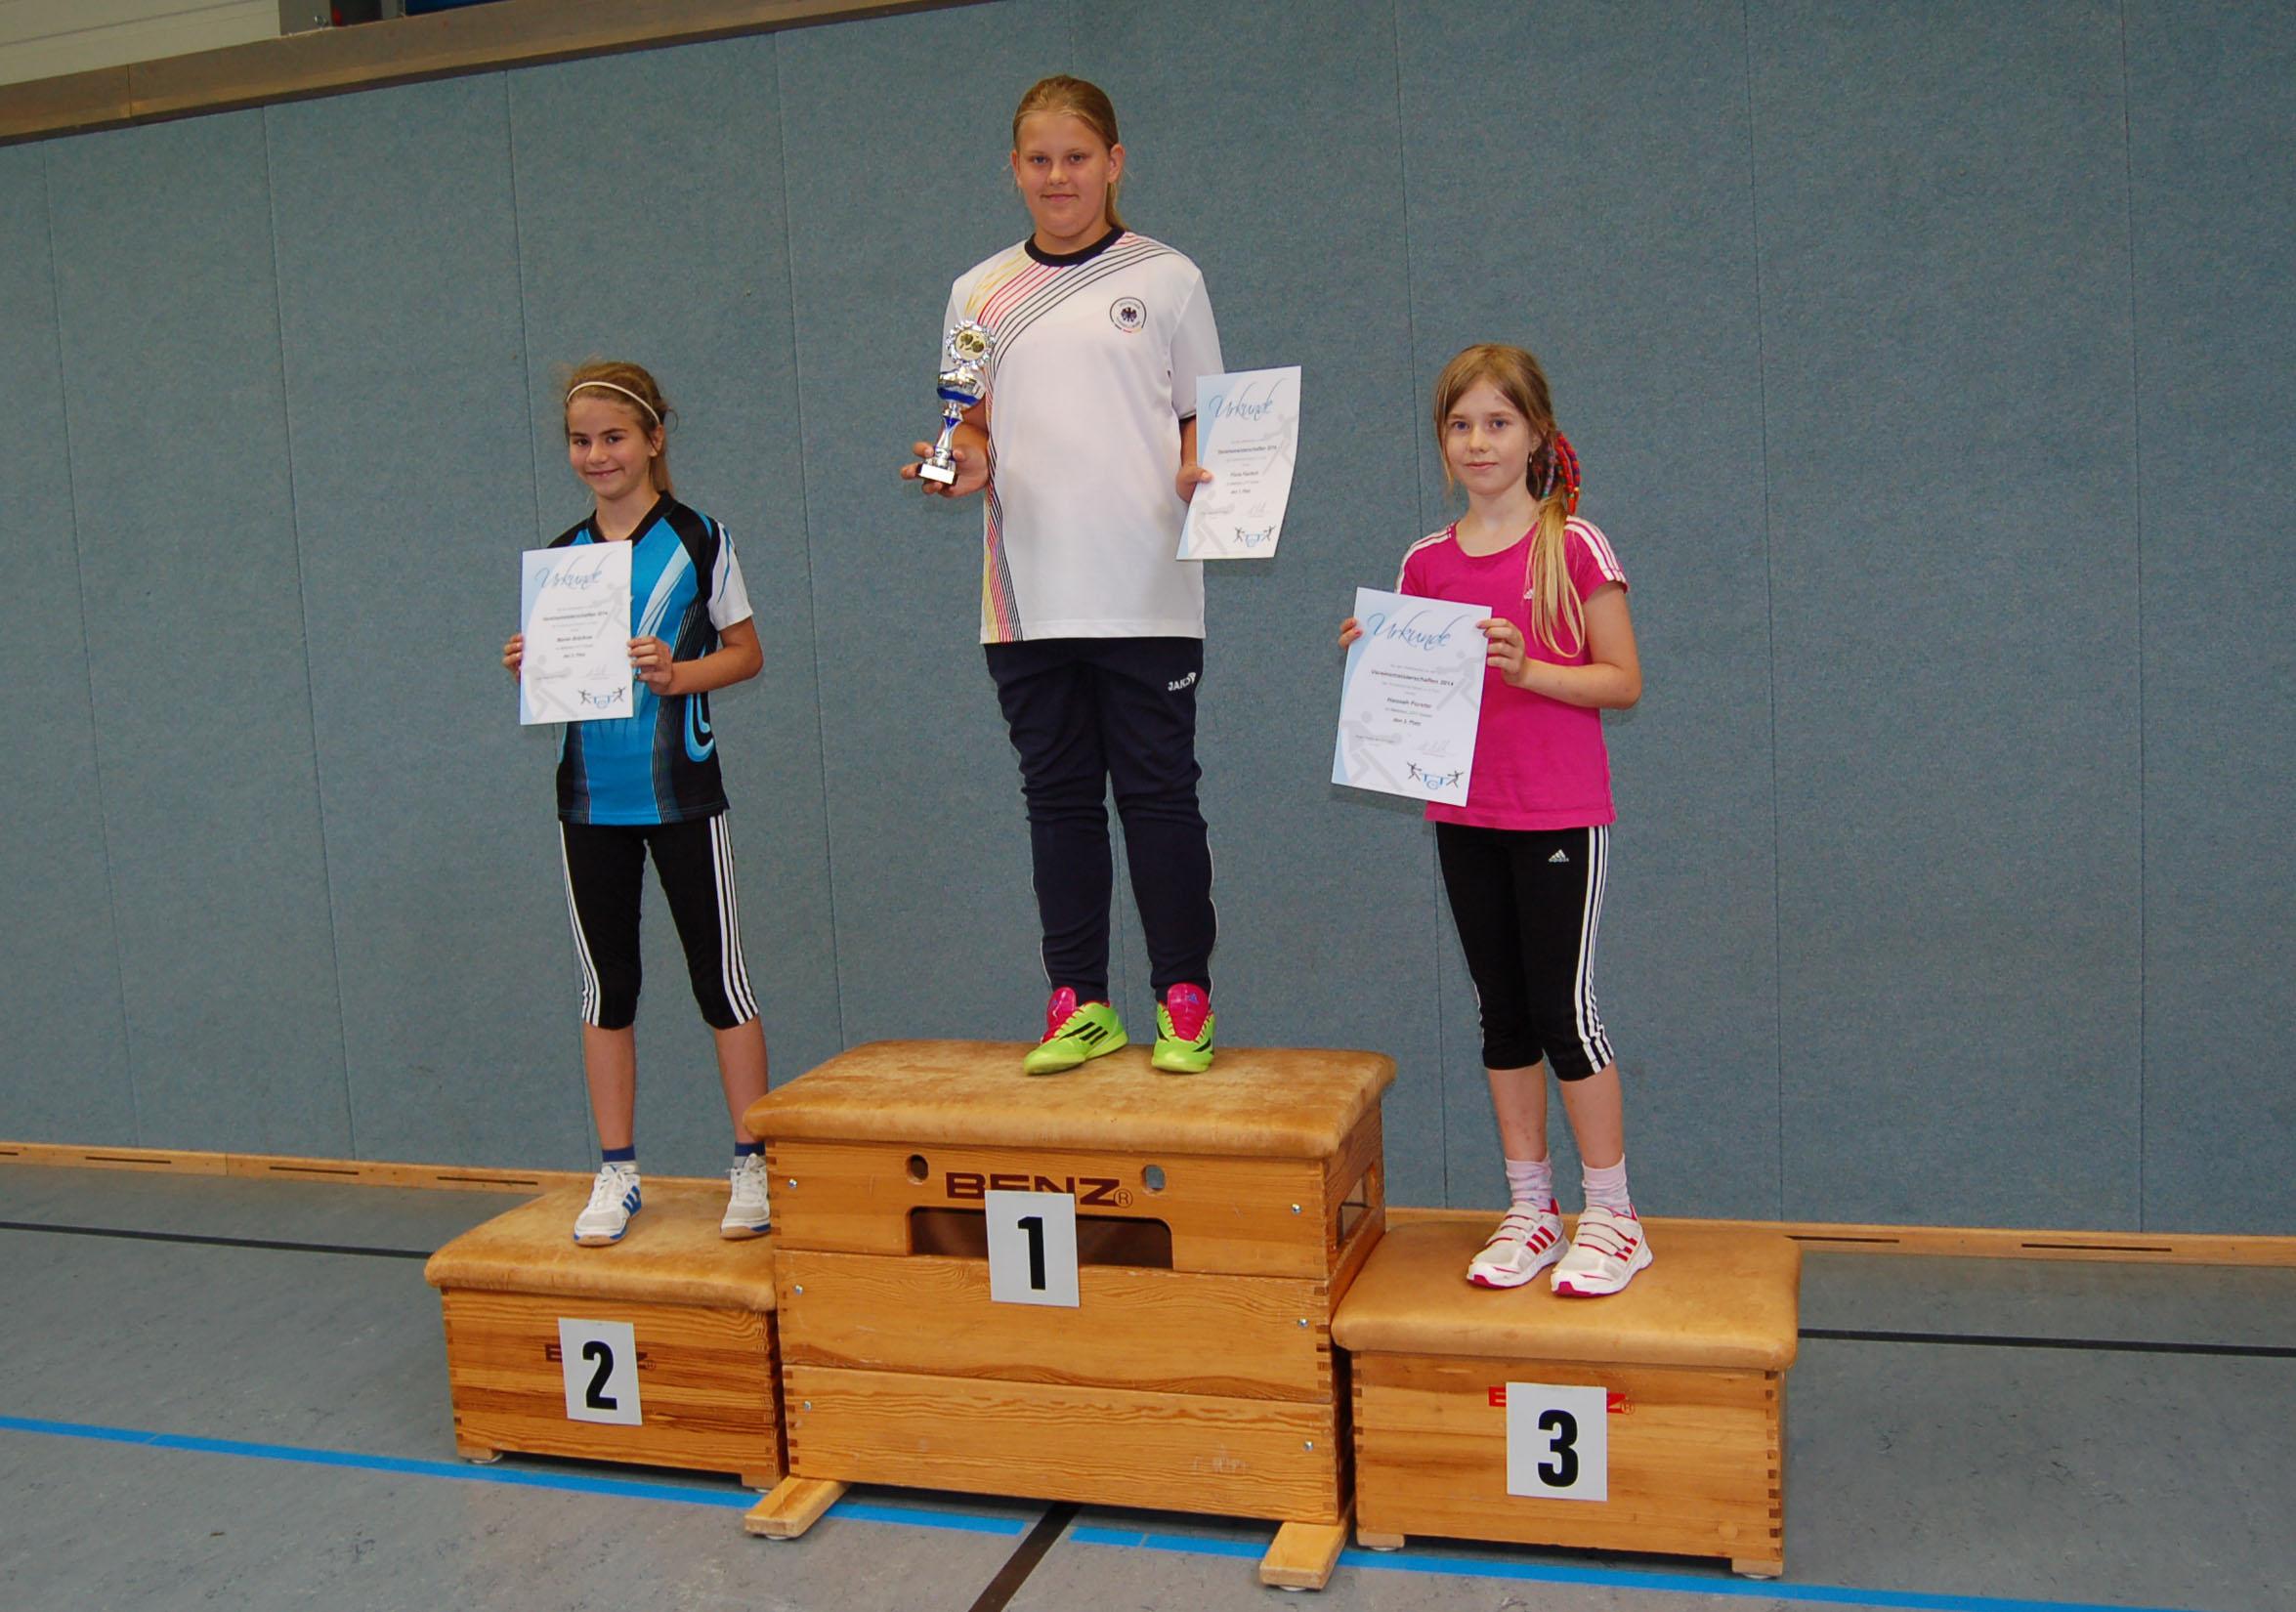 Vereinsmeisterschaft 2014 Mädchen U11